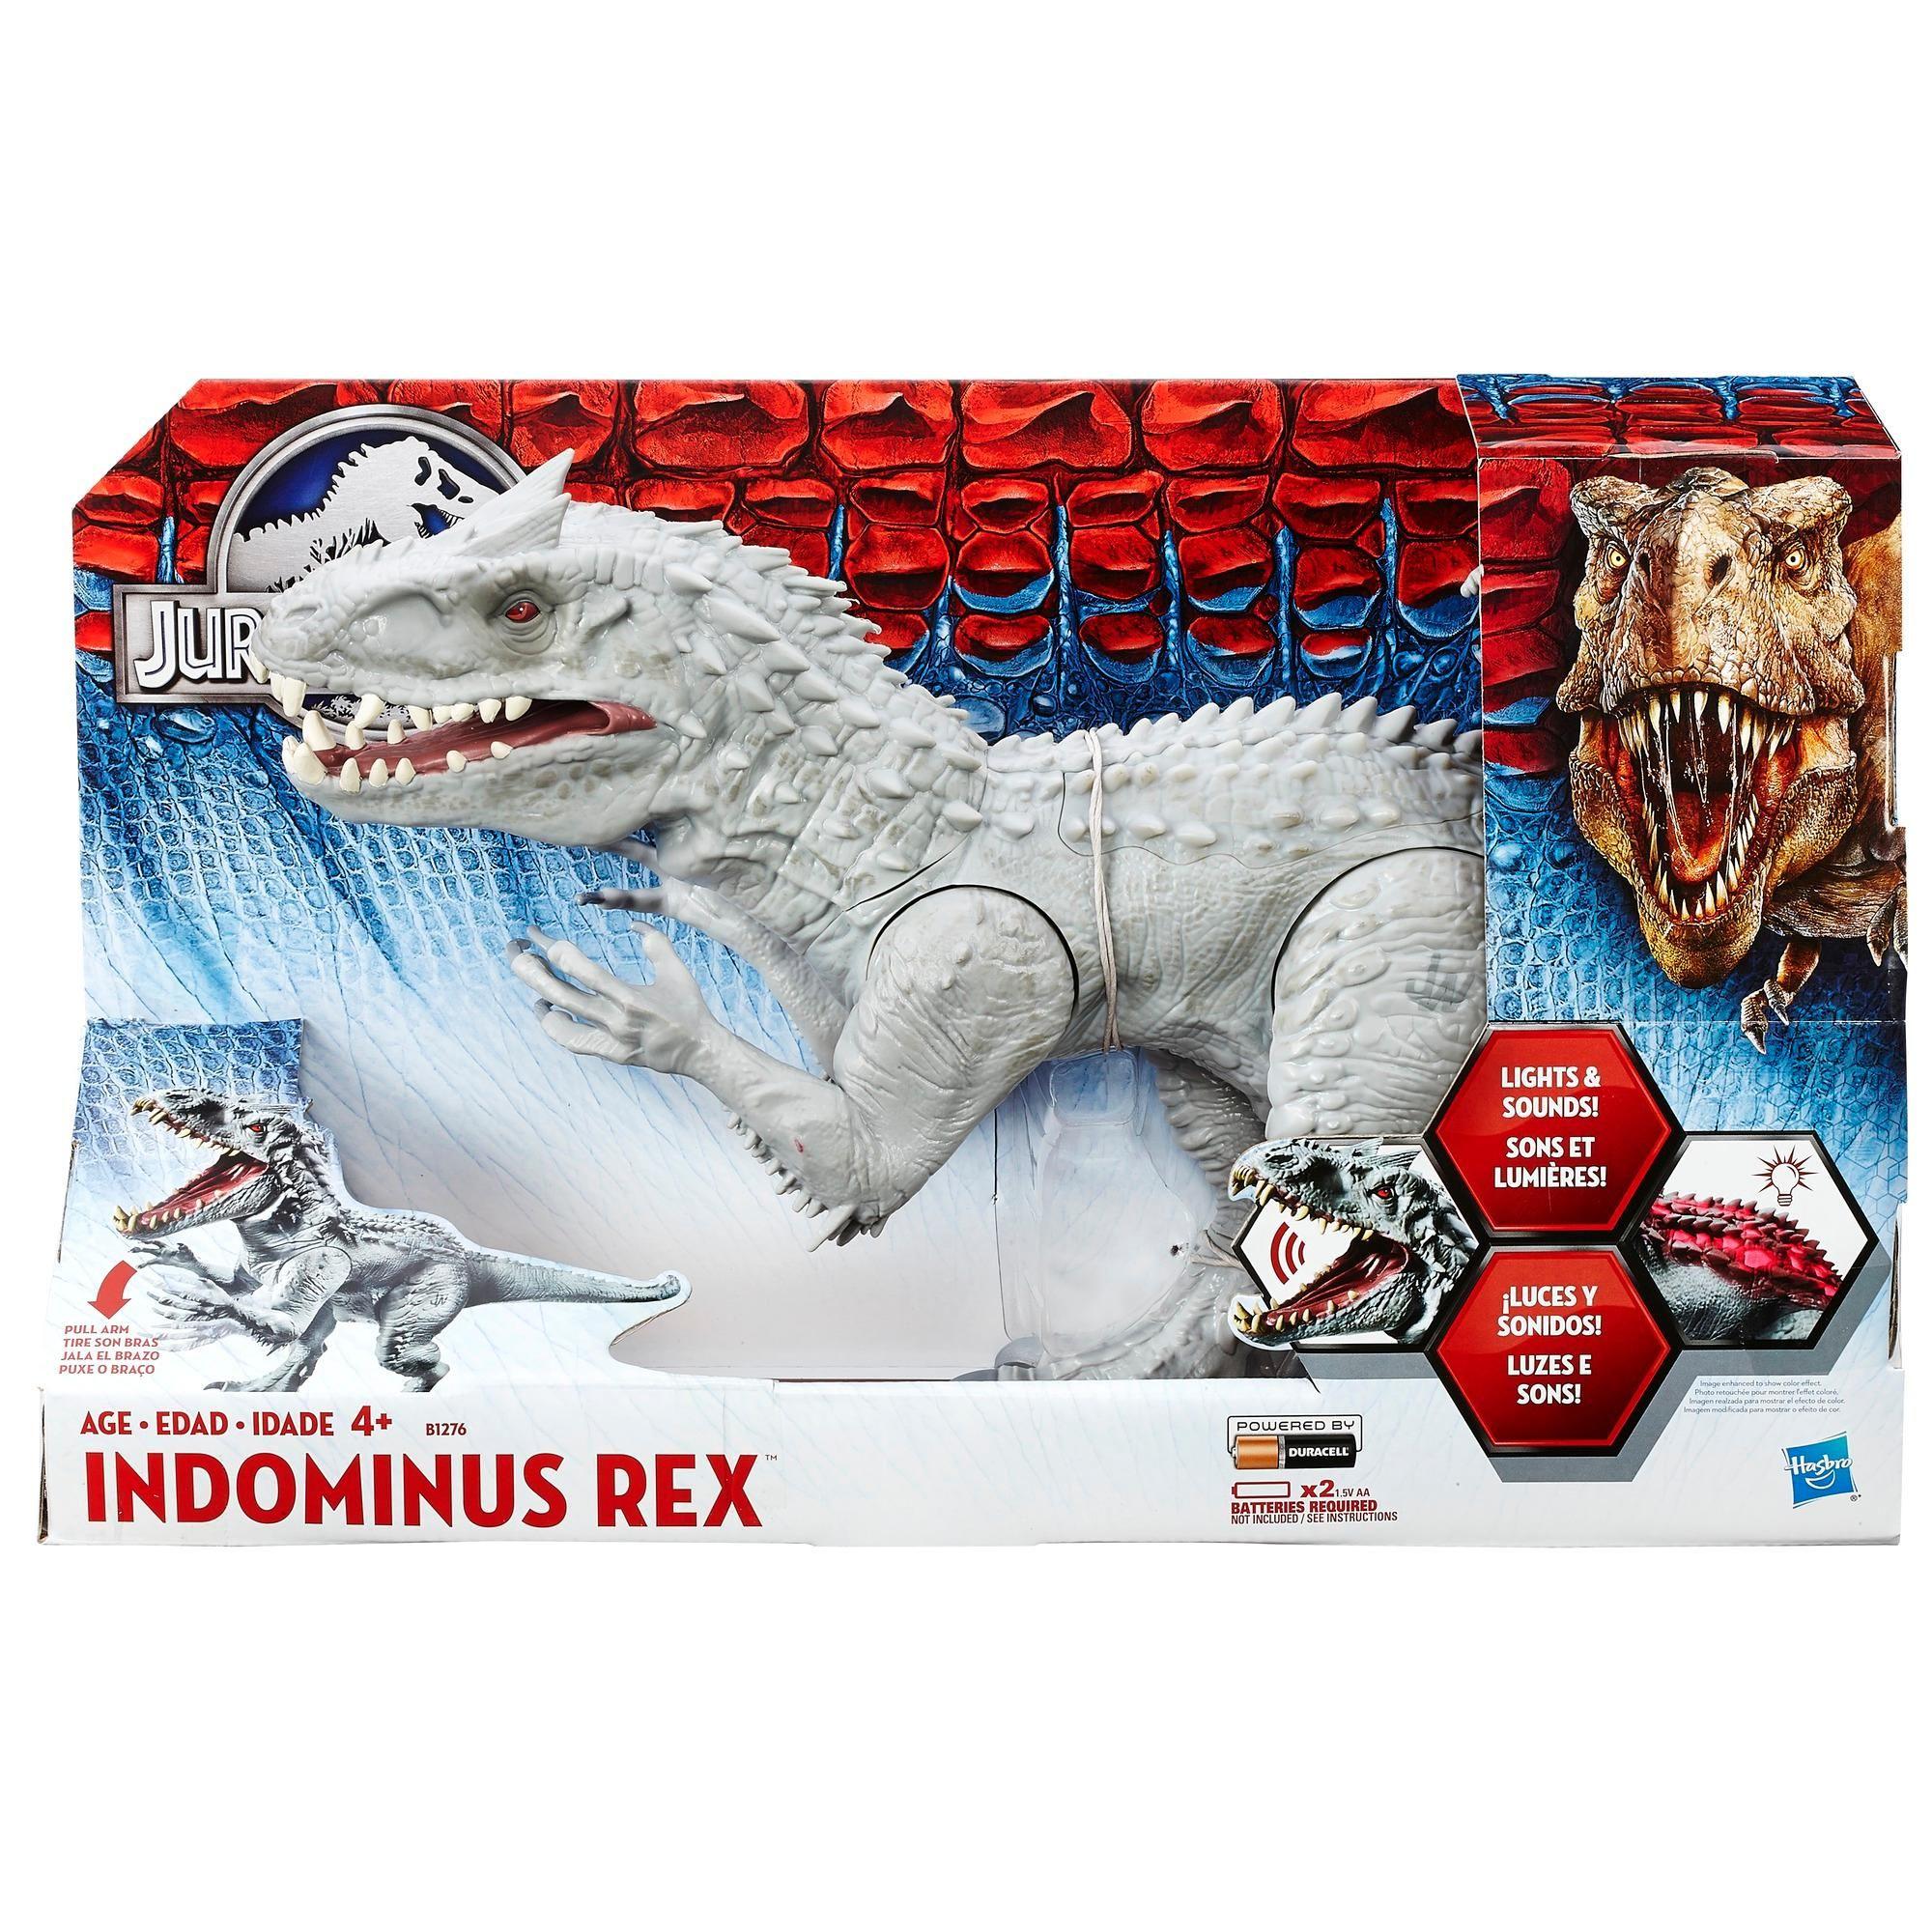 Robot Check Jurassic World Indominus Rex Jurassic World Movie New Jurassic World